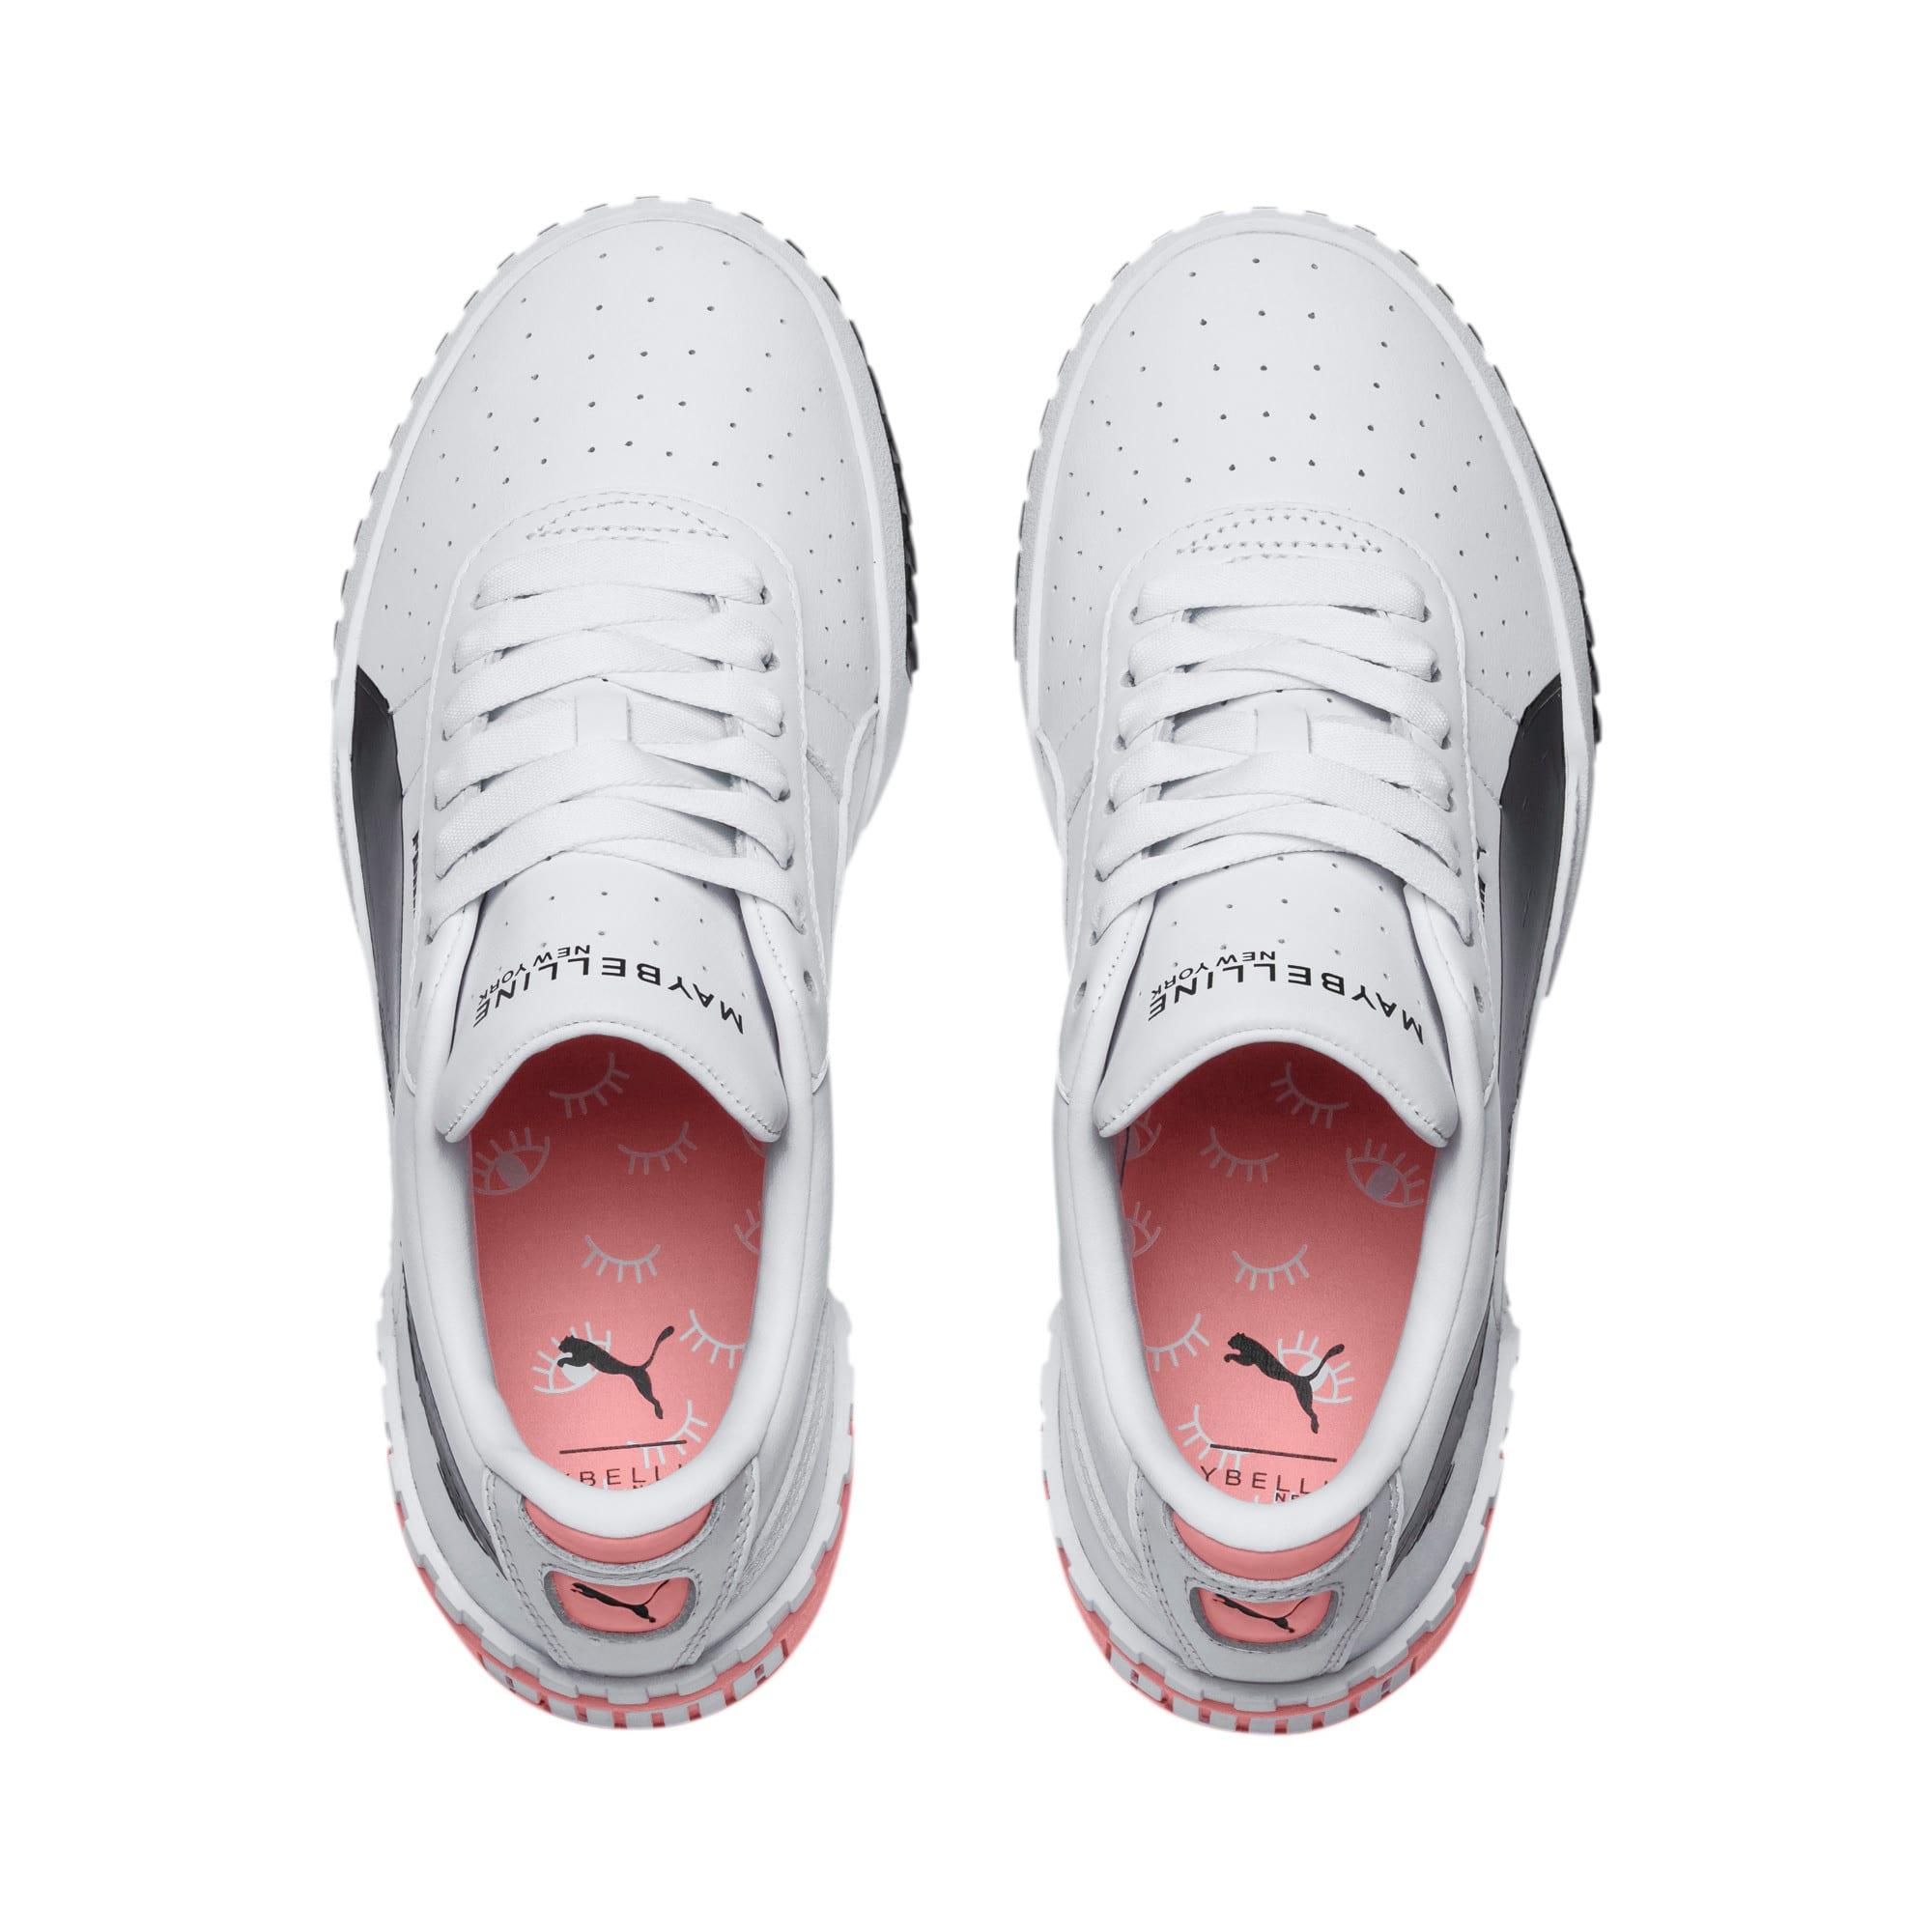 Thumbnail 6 of PUMA x MAYBELLINE Cali Women's Sneakers, Puma White-Puma Black, medium